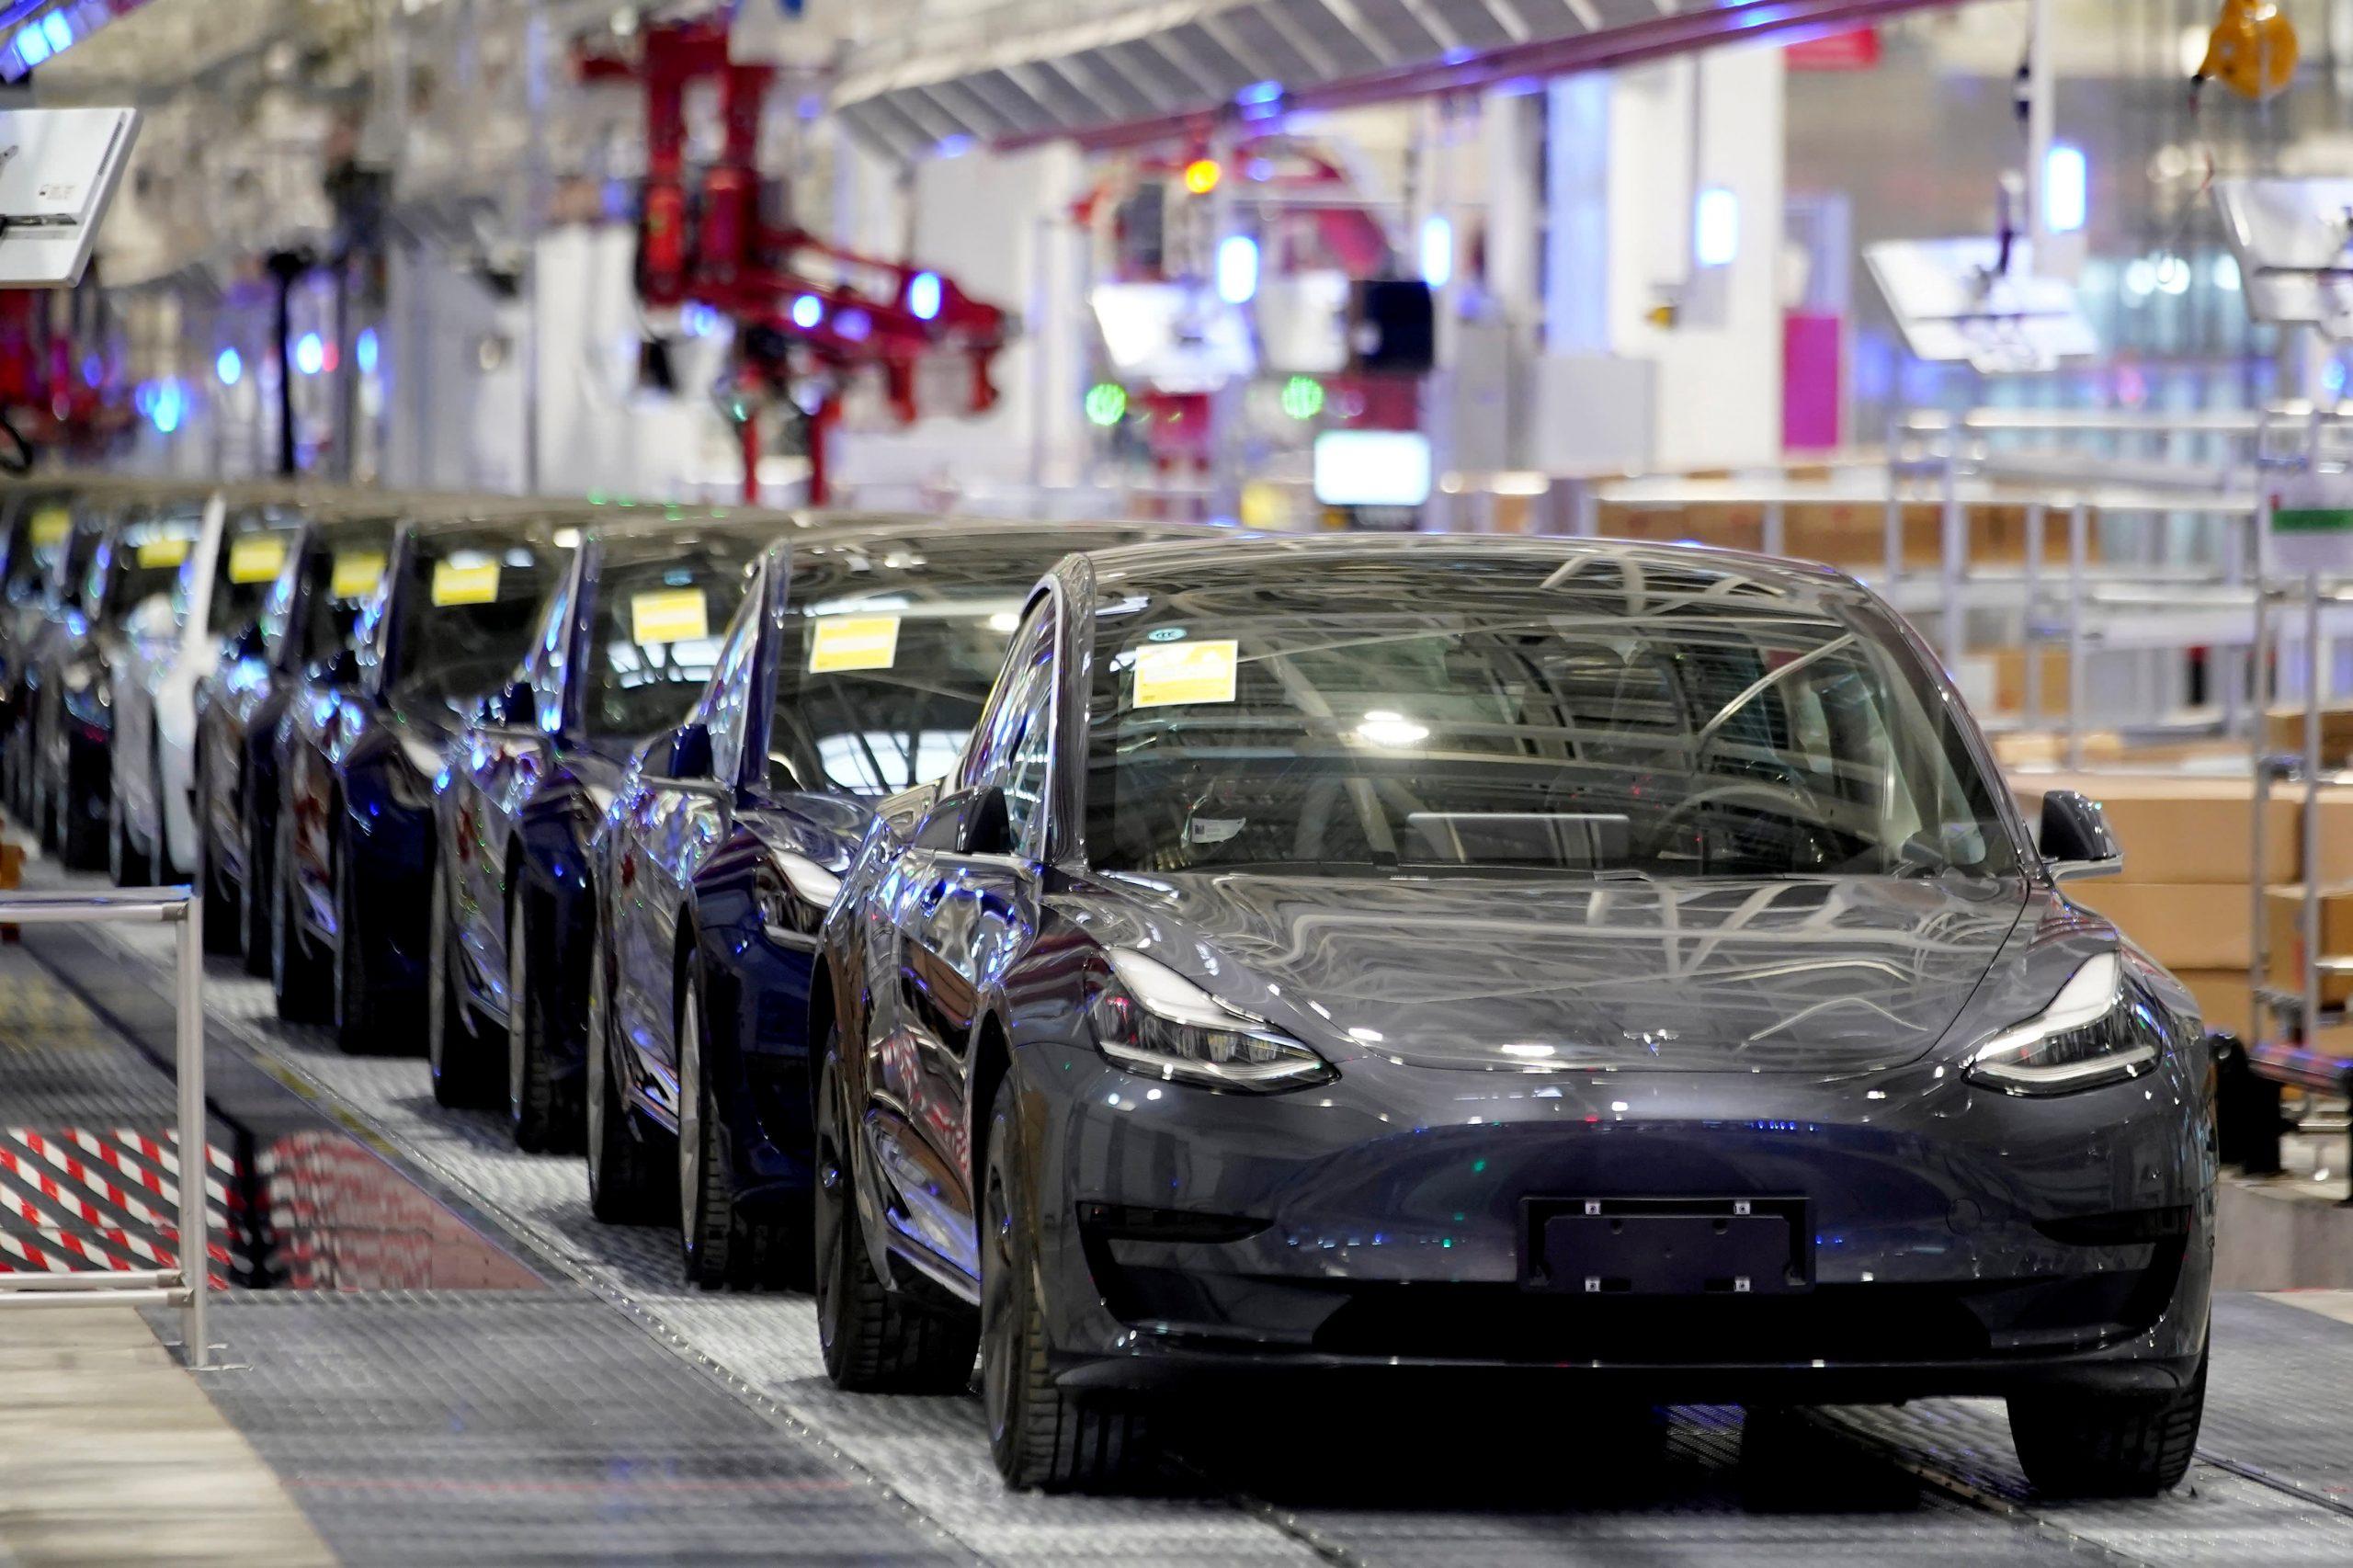 It is said that a Tesla Model 3 car explodes in a Shanghai garage